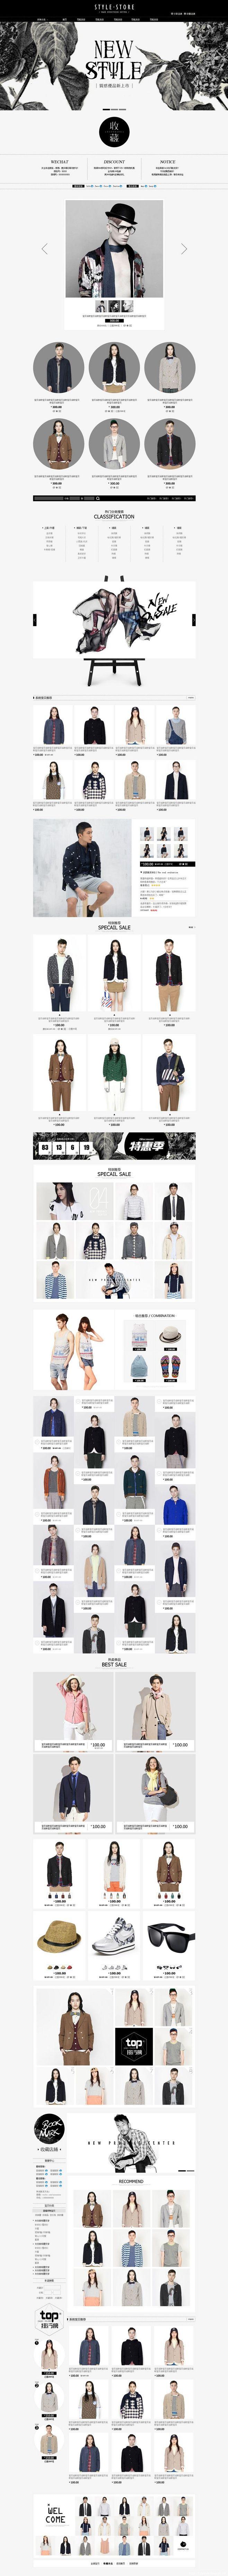 Banner设计欣赏网站 – 横幅广告促...